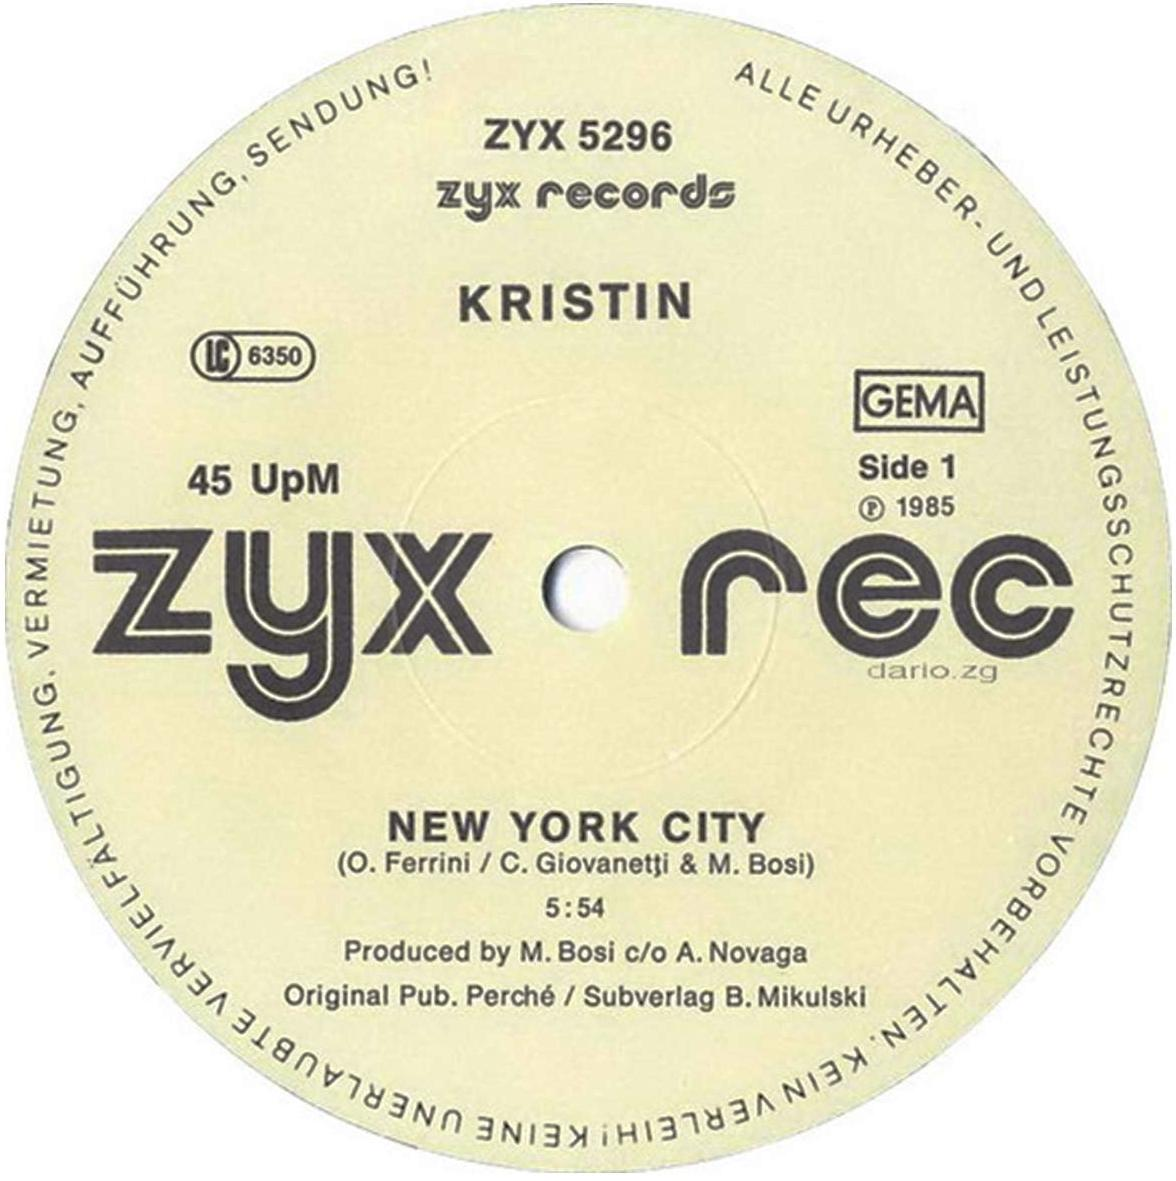 Etichetta disco germania.jpg?303